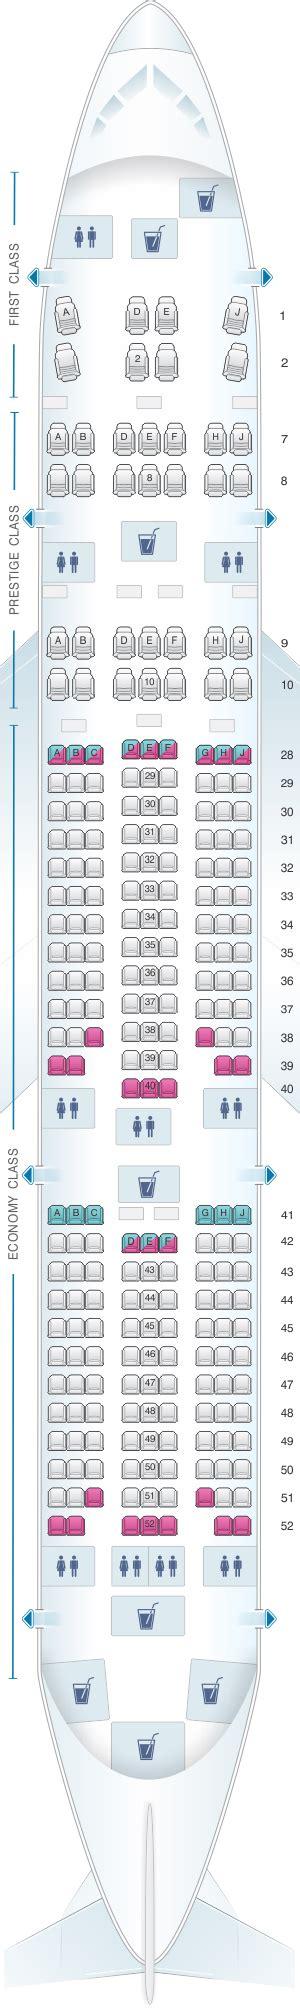 korean air seat seat map korean air boeing b777 200er 248pax seatmaestro